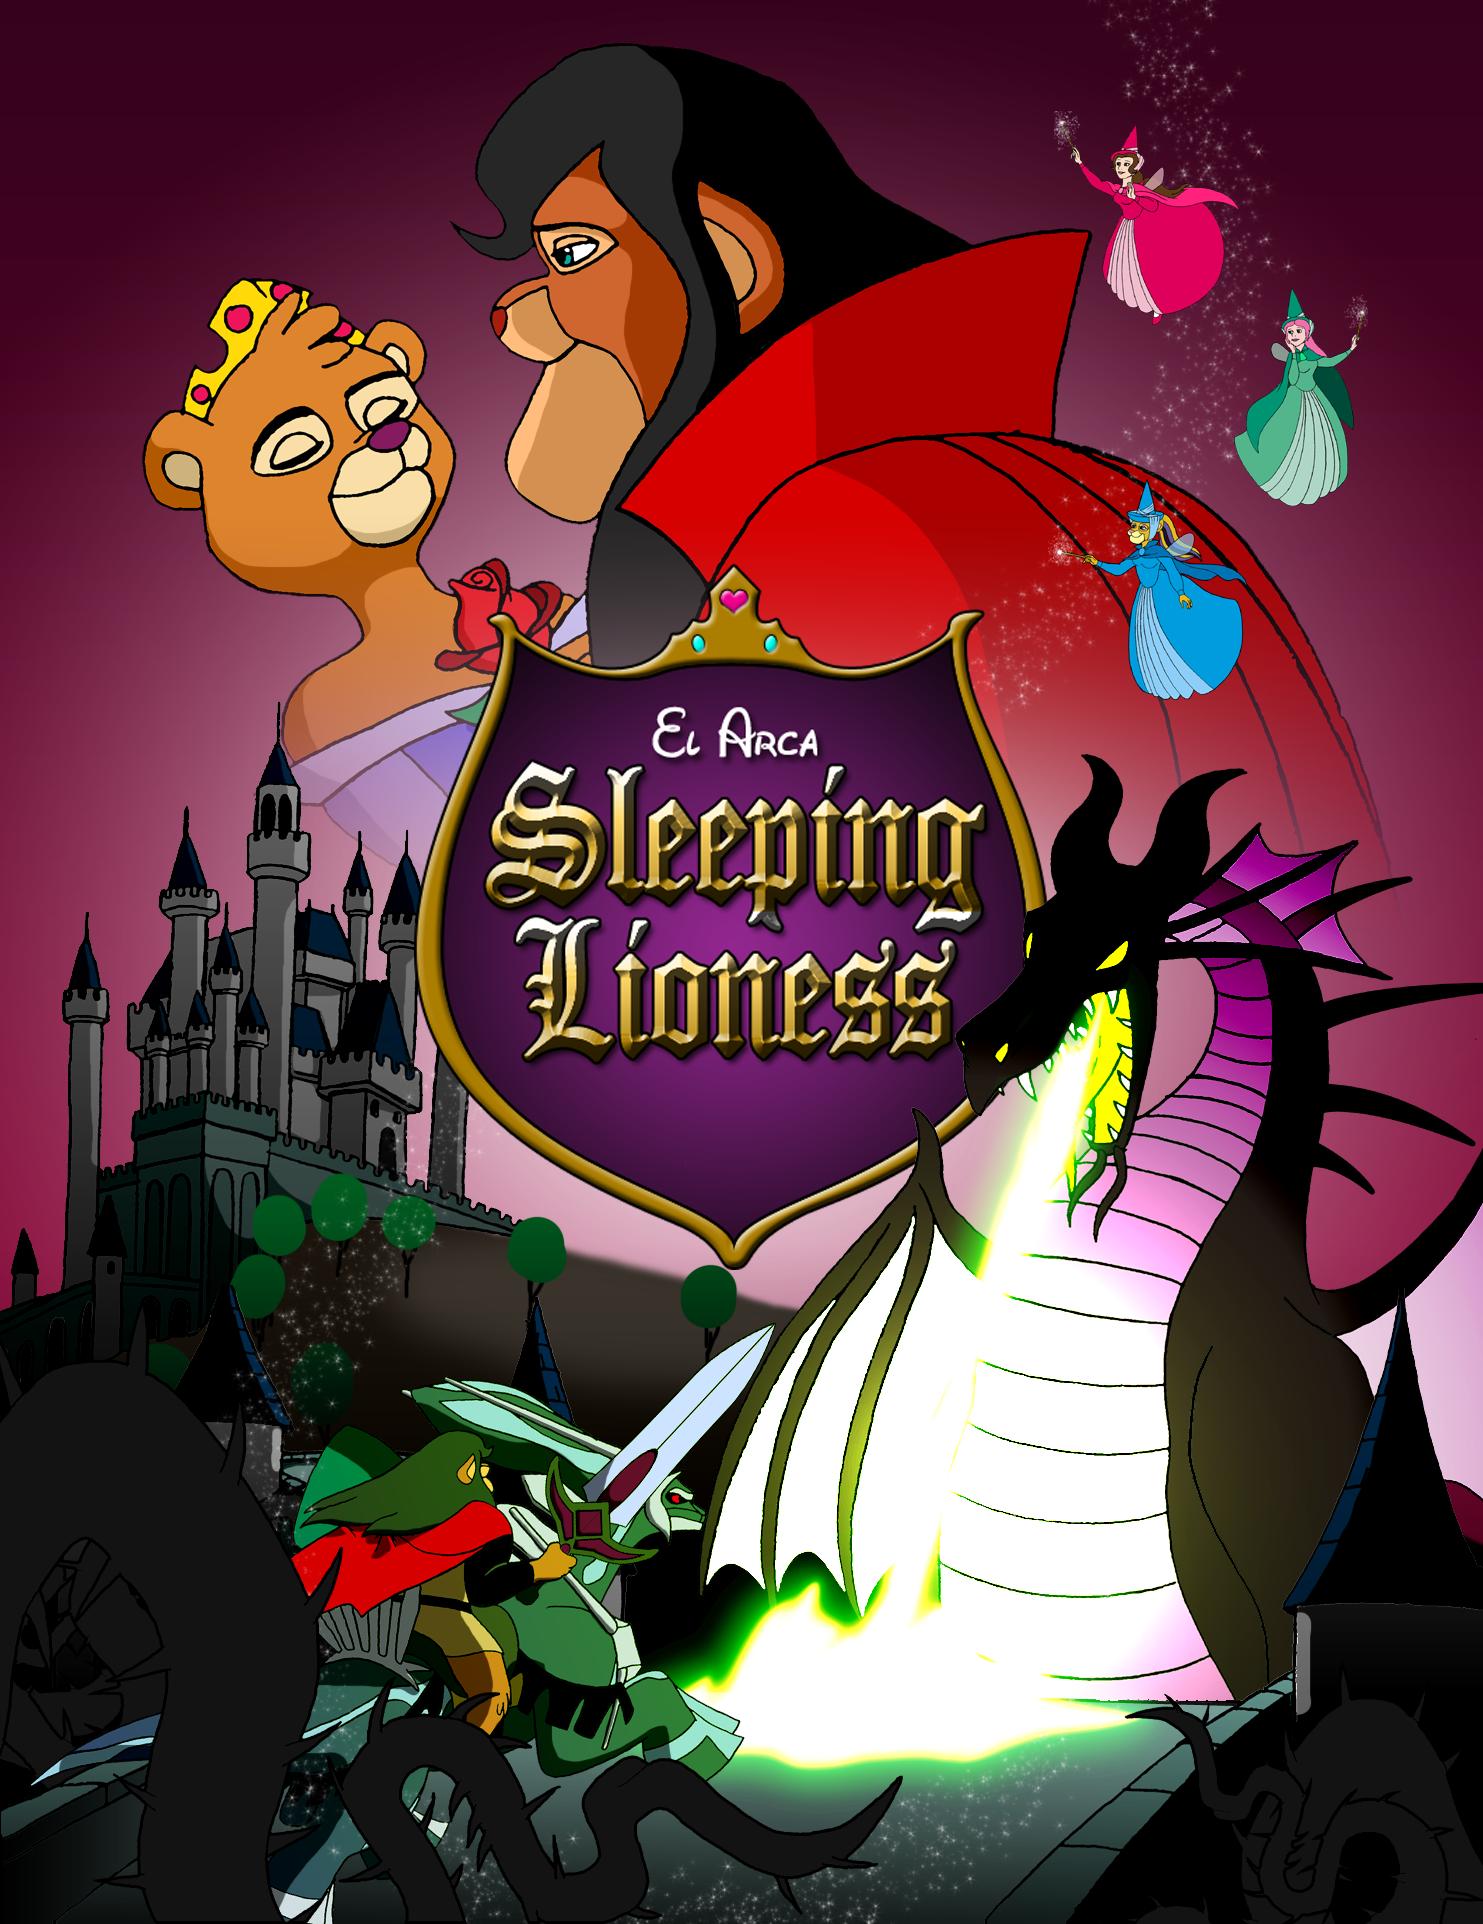 Sleeping Lioness | Pooh's Adventures Wiki | FANDOM powered by Wikia